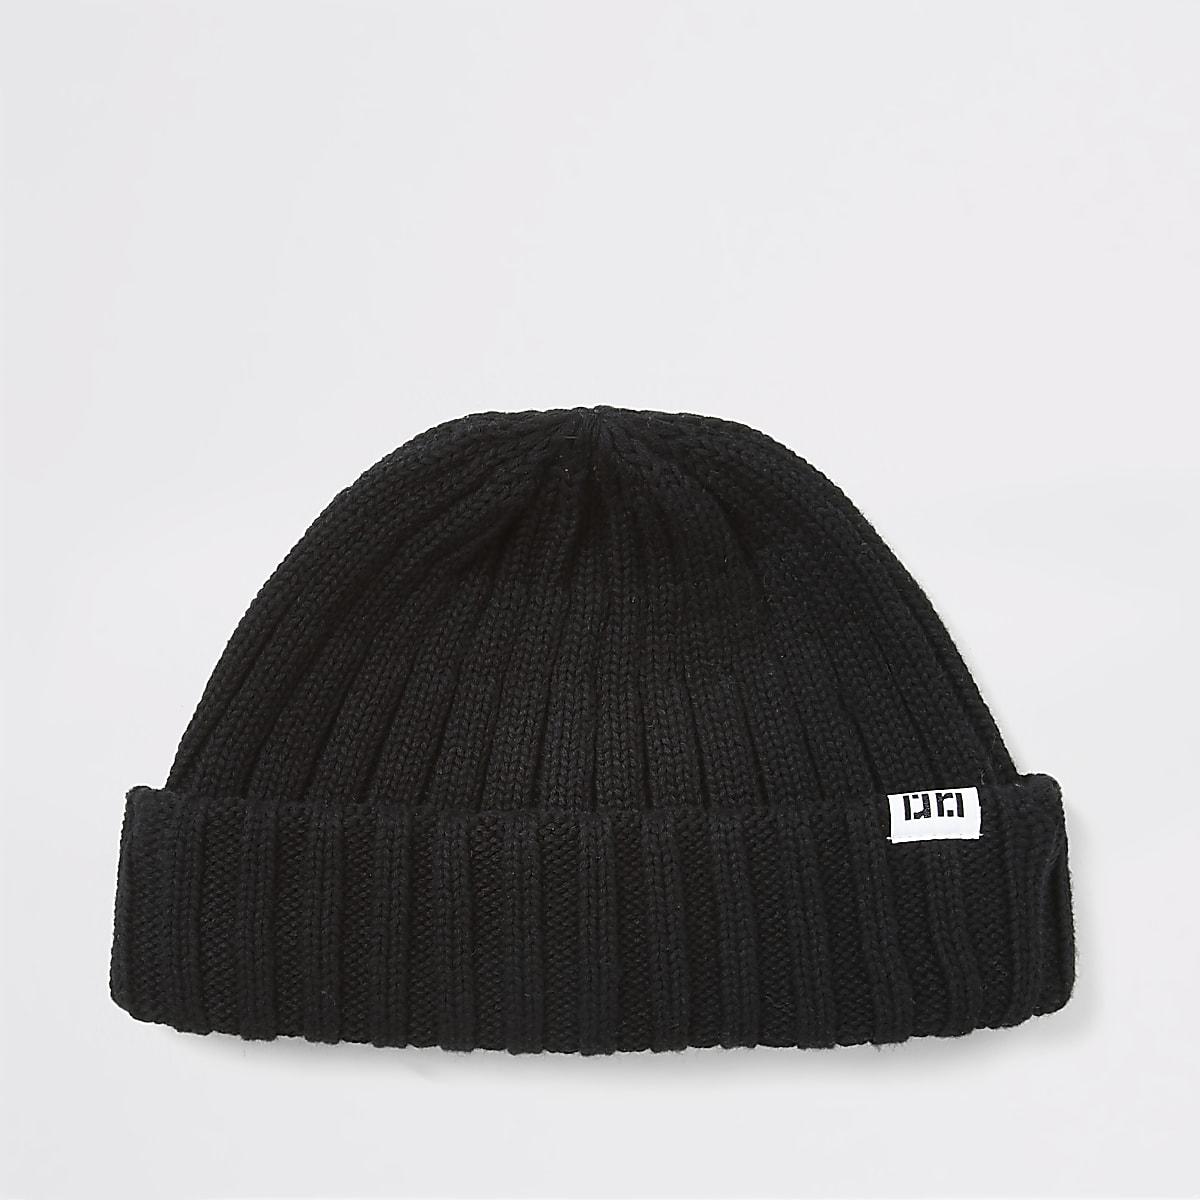 Black knitted RI beanie hat